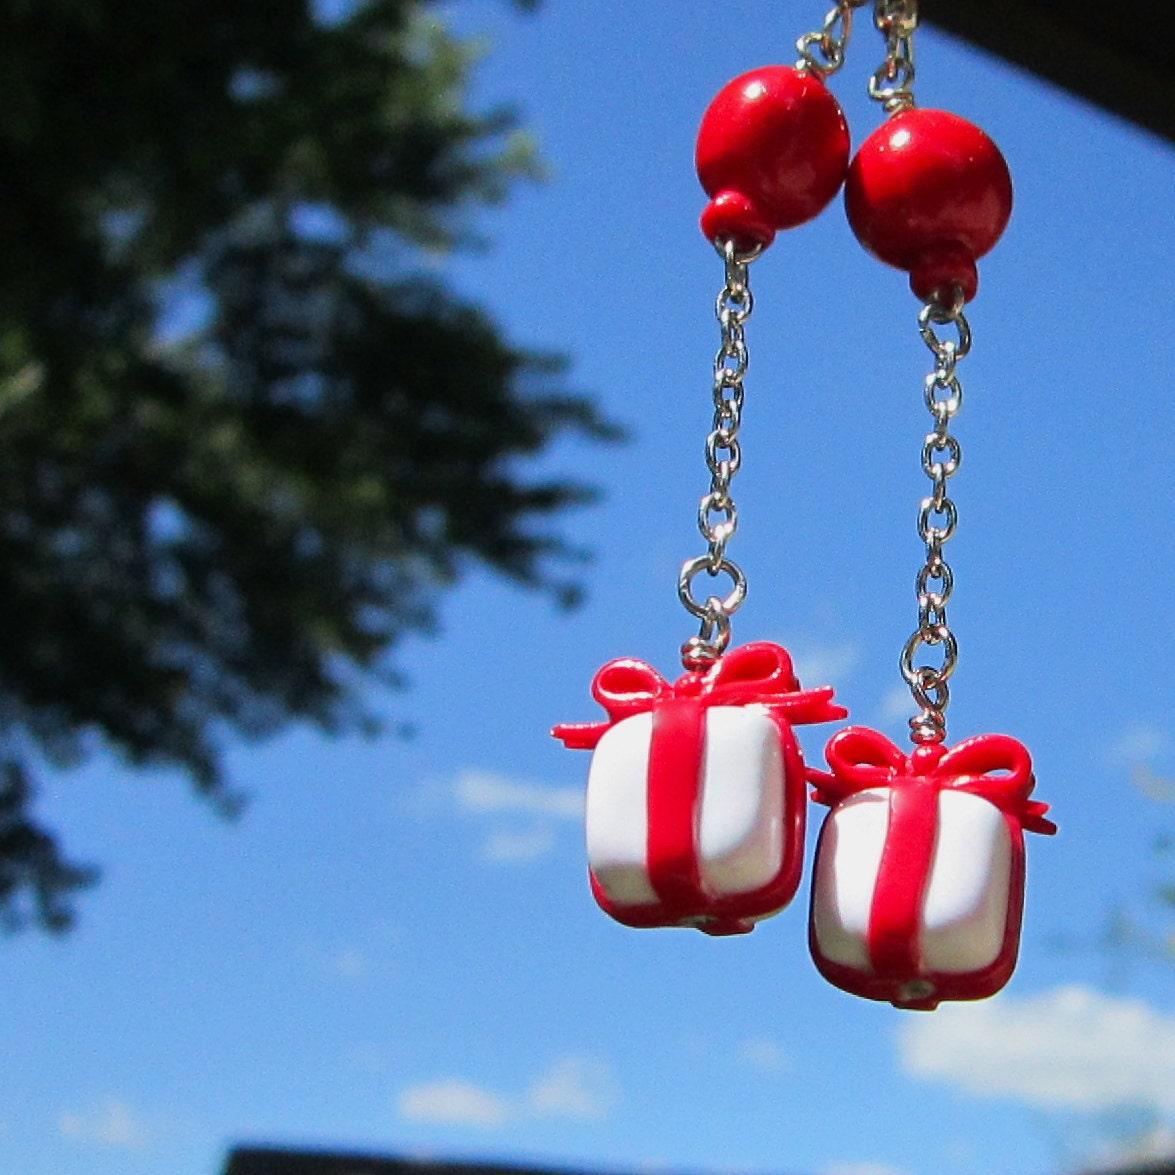 Animal Crossing floating balloon present earrings - TrenoNights